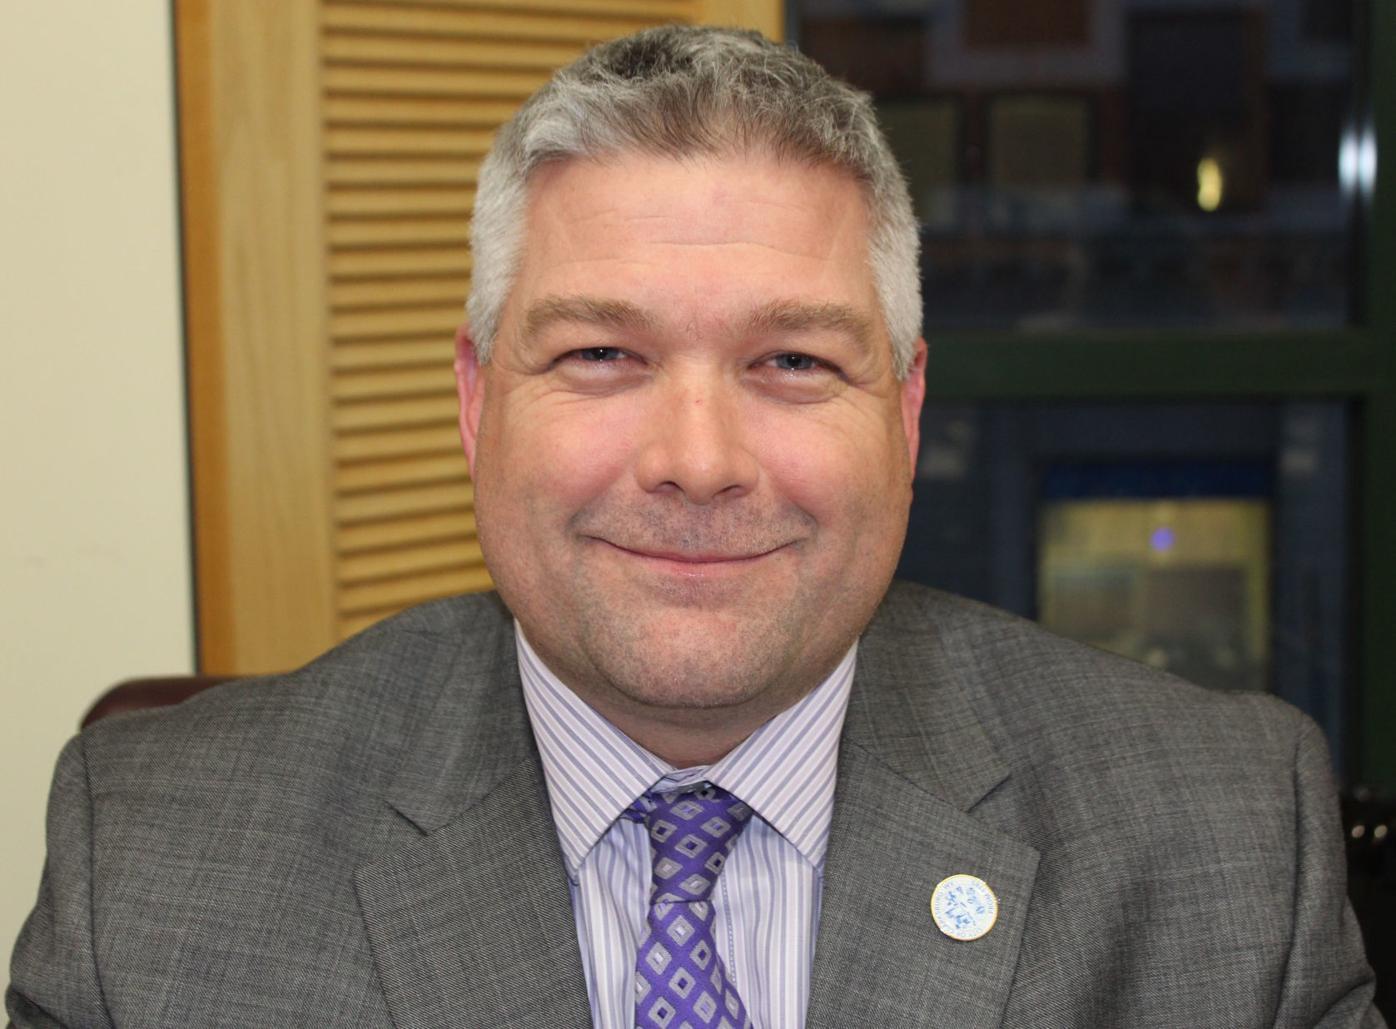 Martin Howe